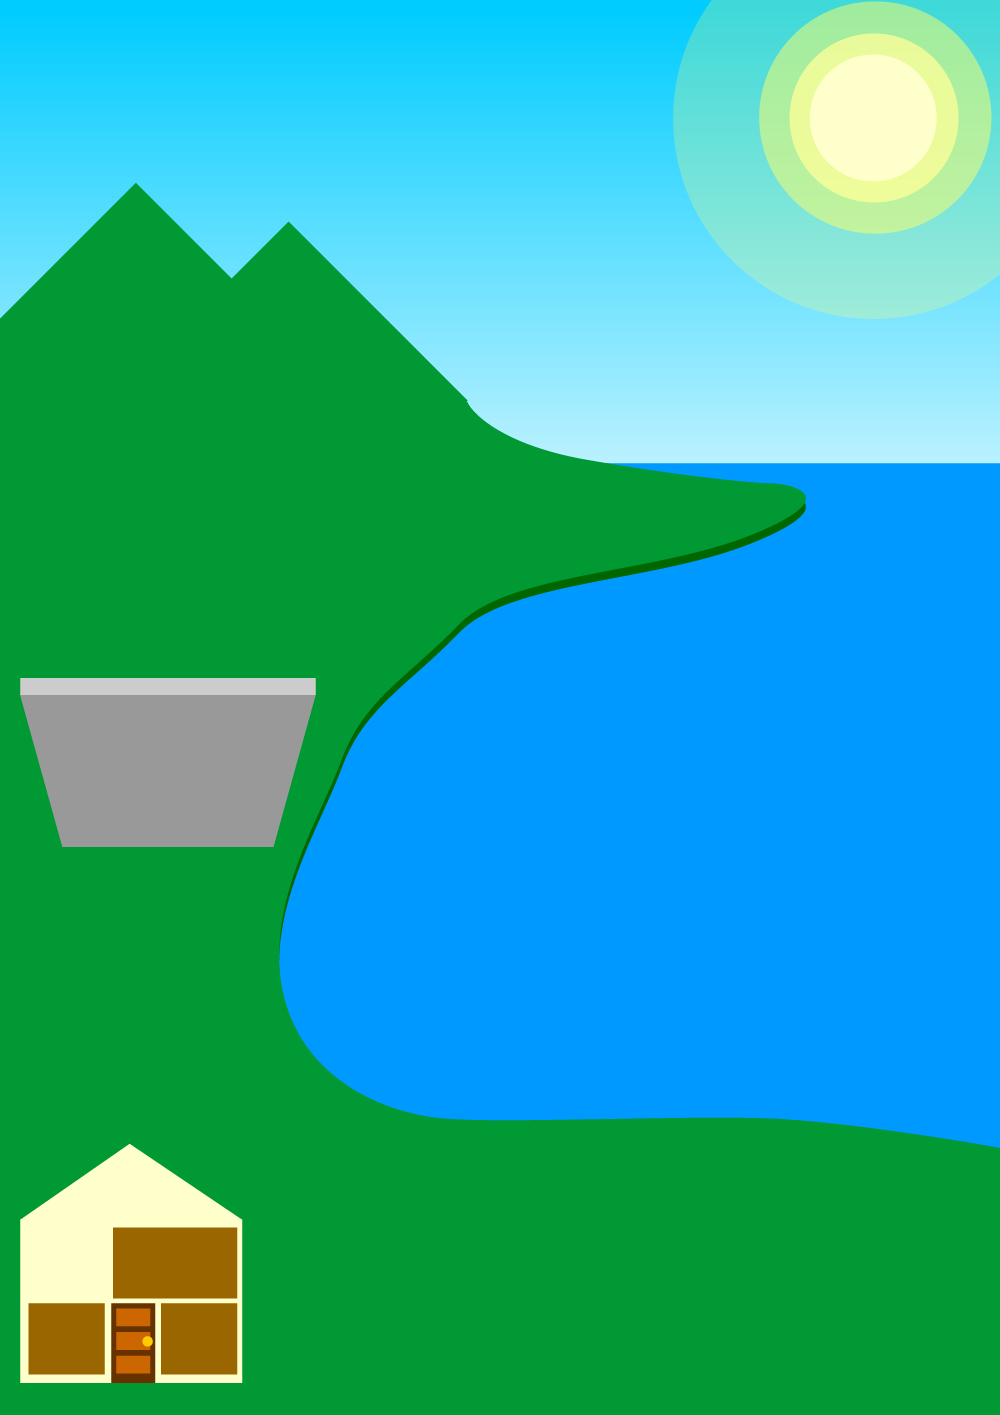 waterCycleExample2